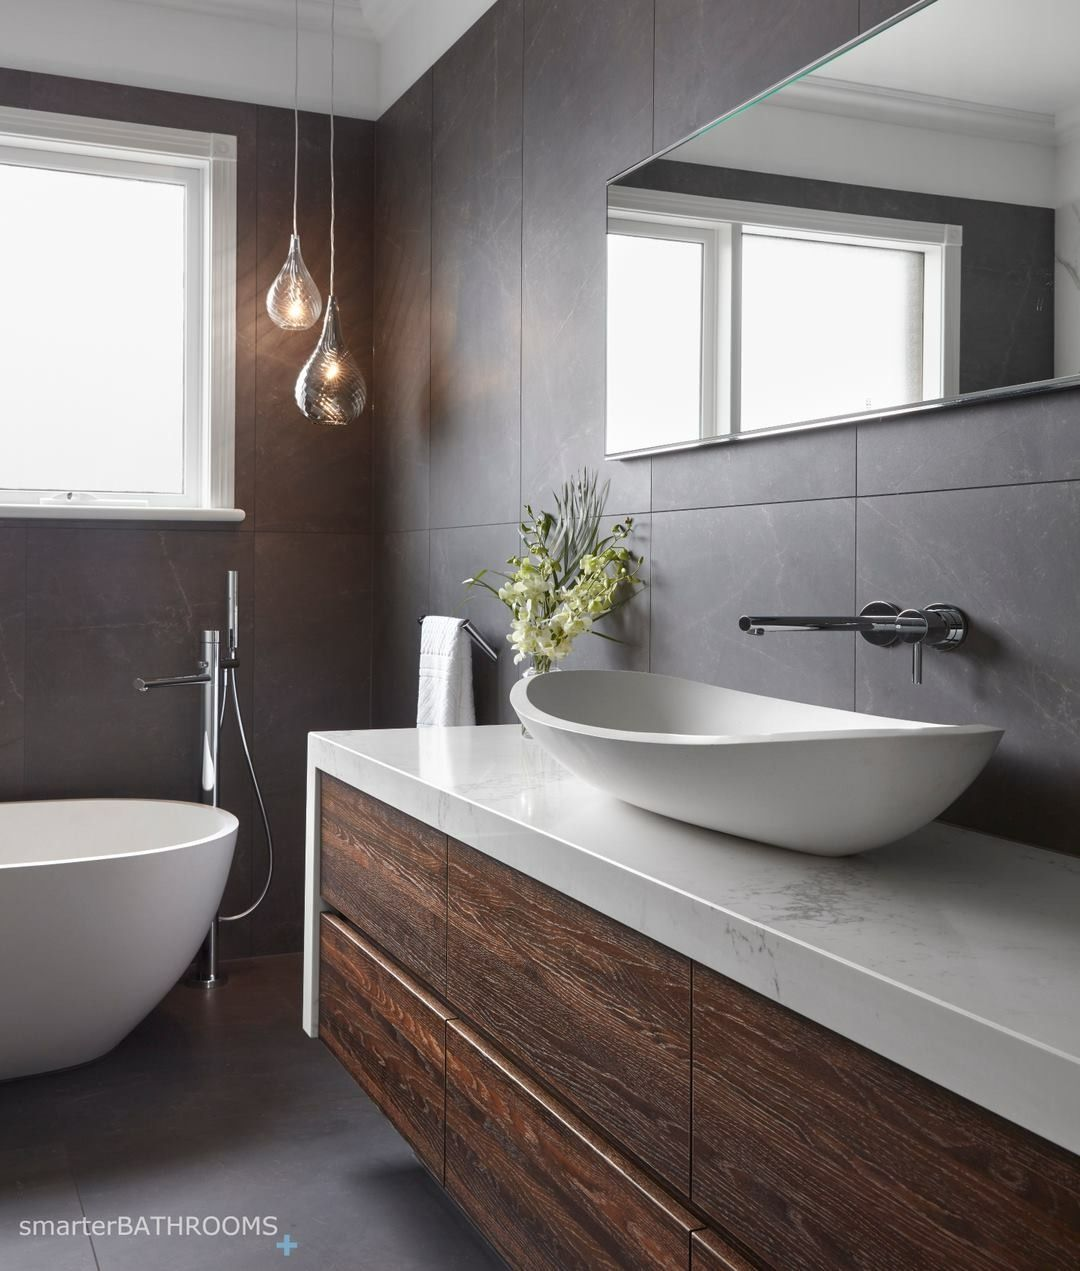 Perfect basin | Bathroom renovations melbourne, Bathroom ...